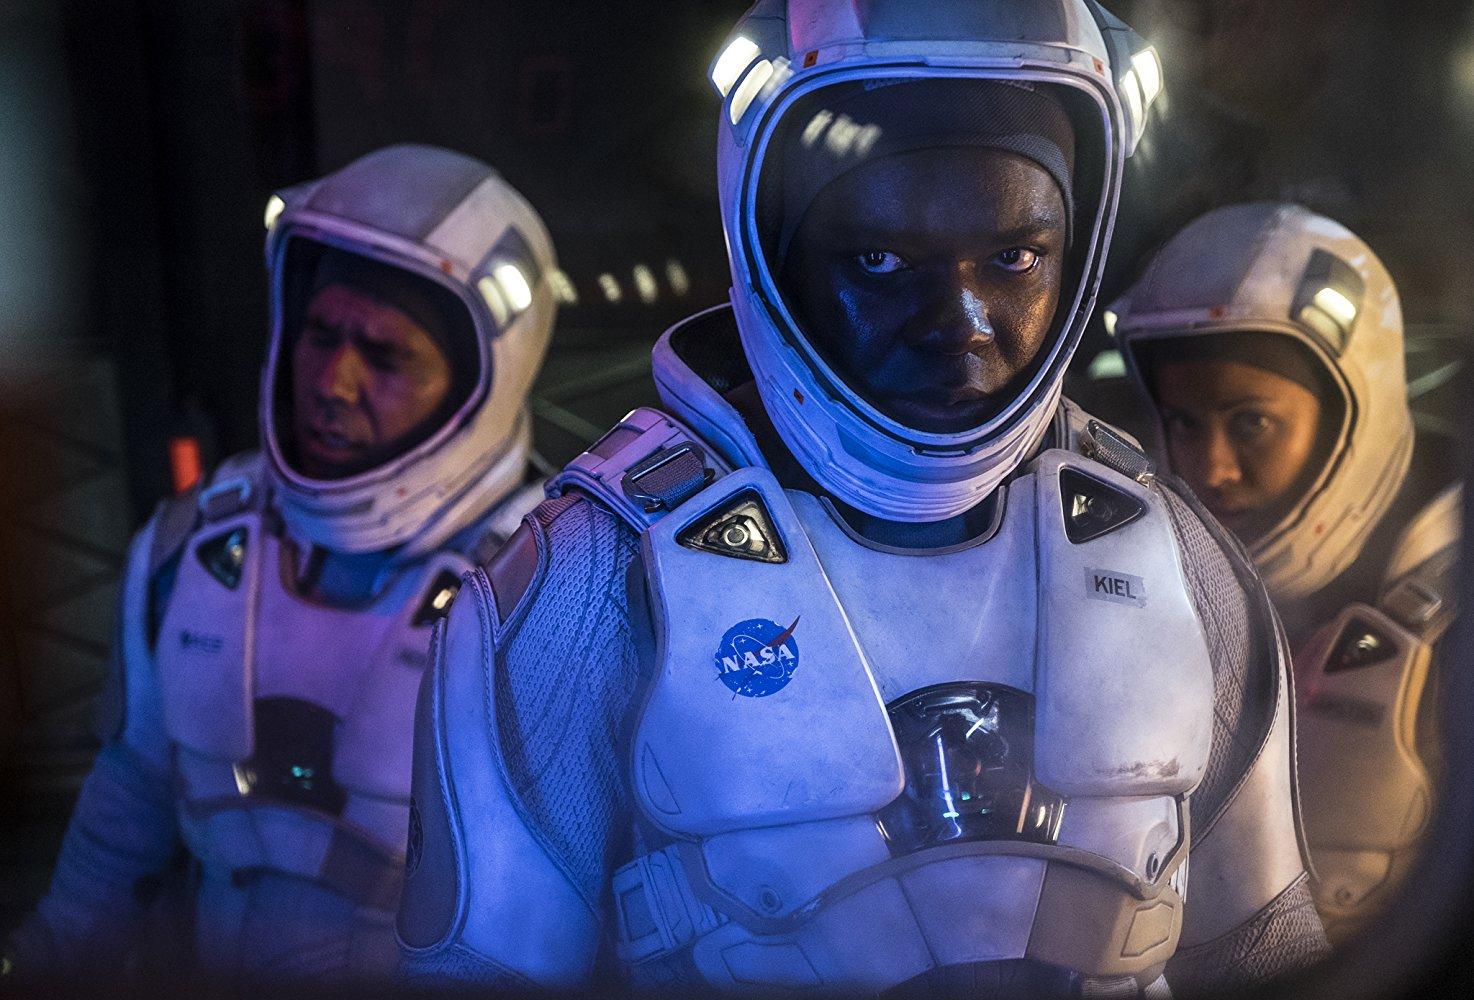 John Ortiz, David Oyelowo, and Gugu Mbatha-Raw as astronauts in THE CLOVERFIELD PARADOX (2018)